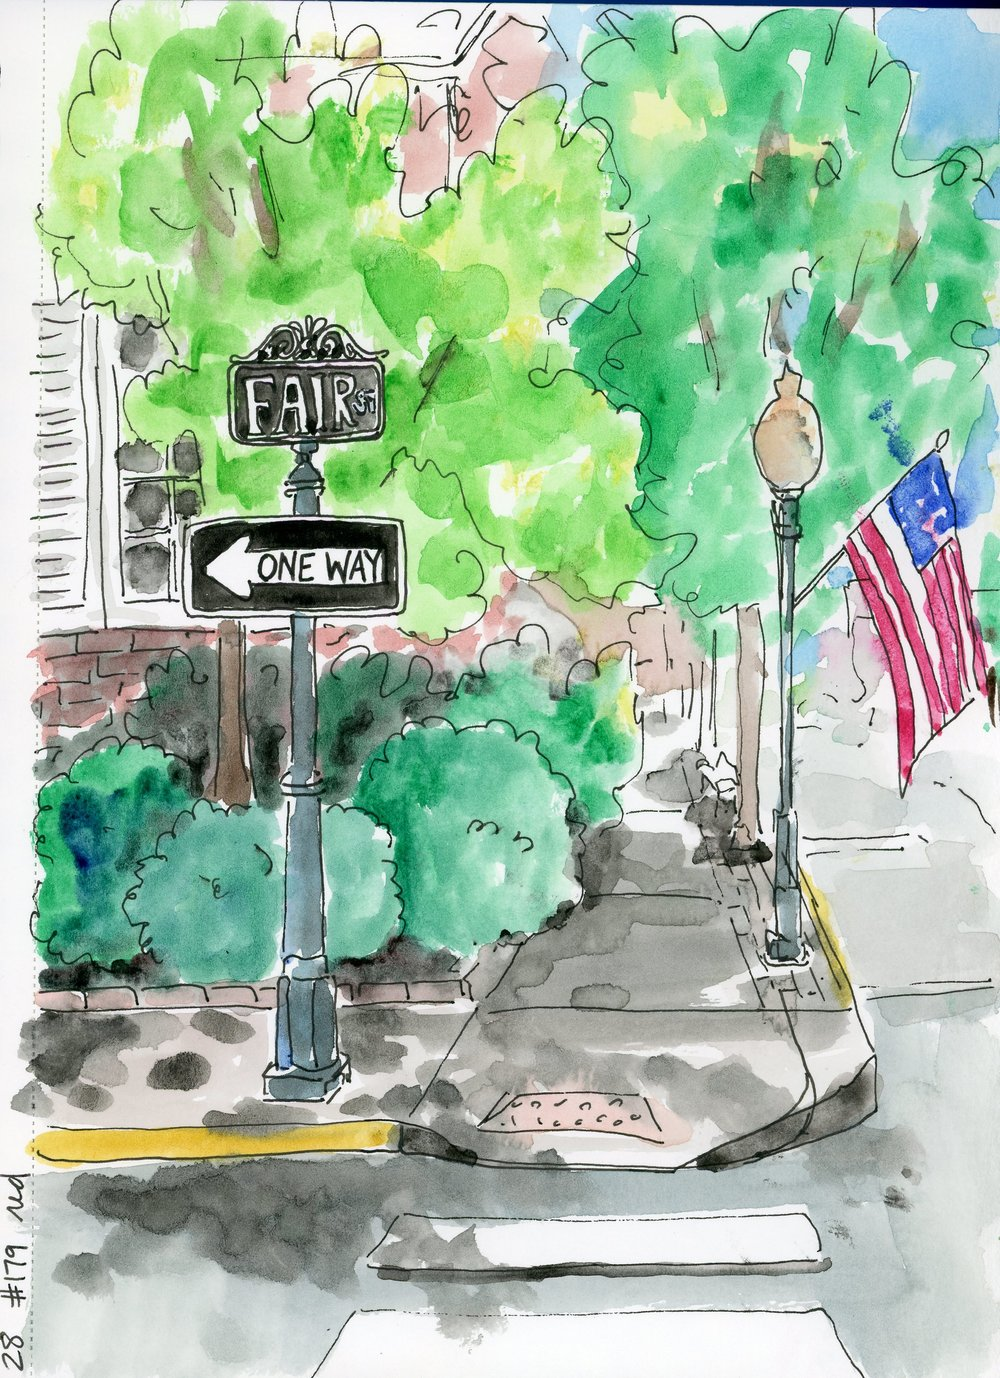 179.streetsign.jpg